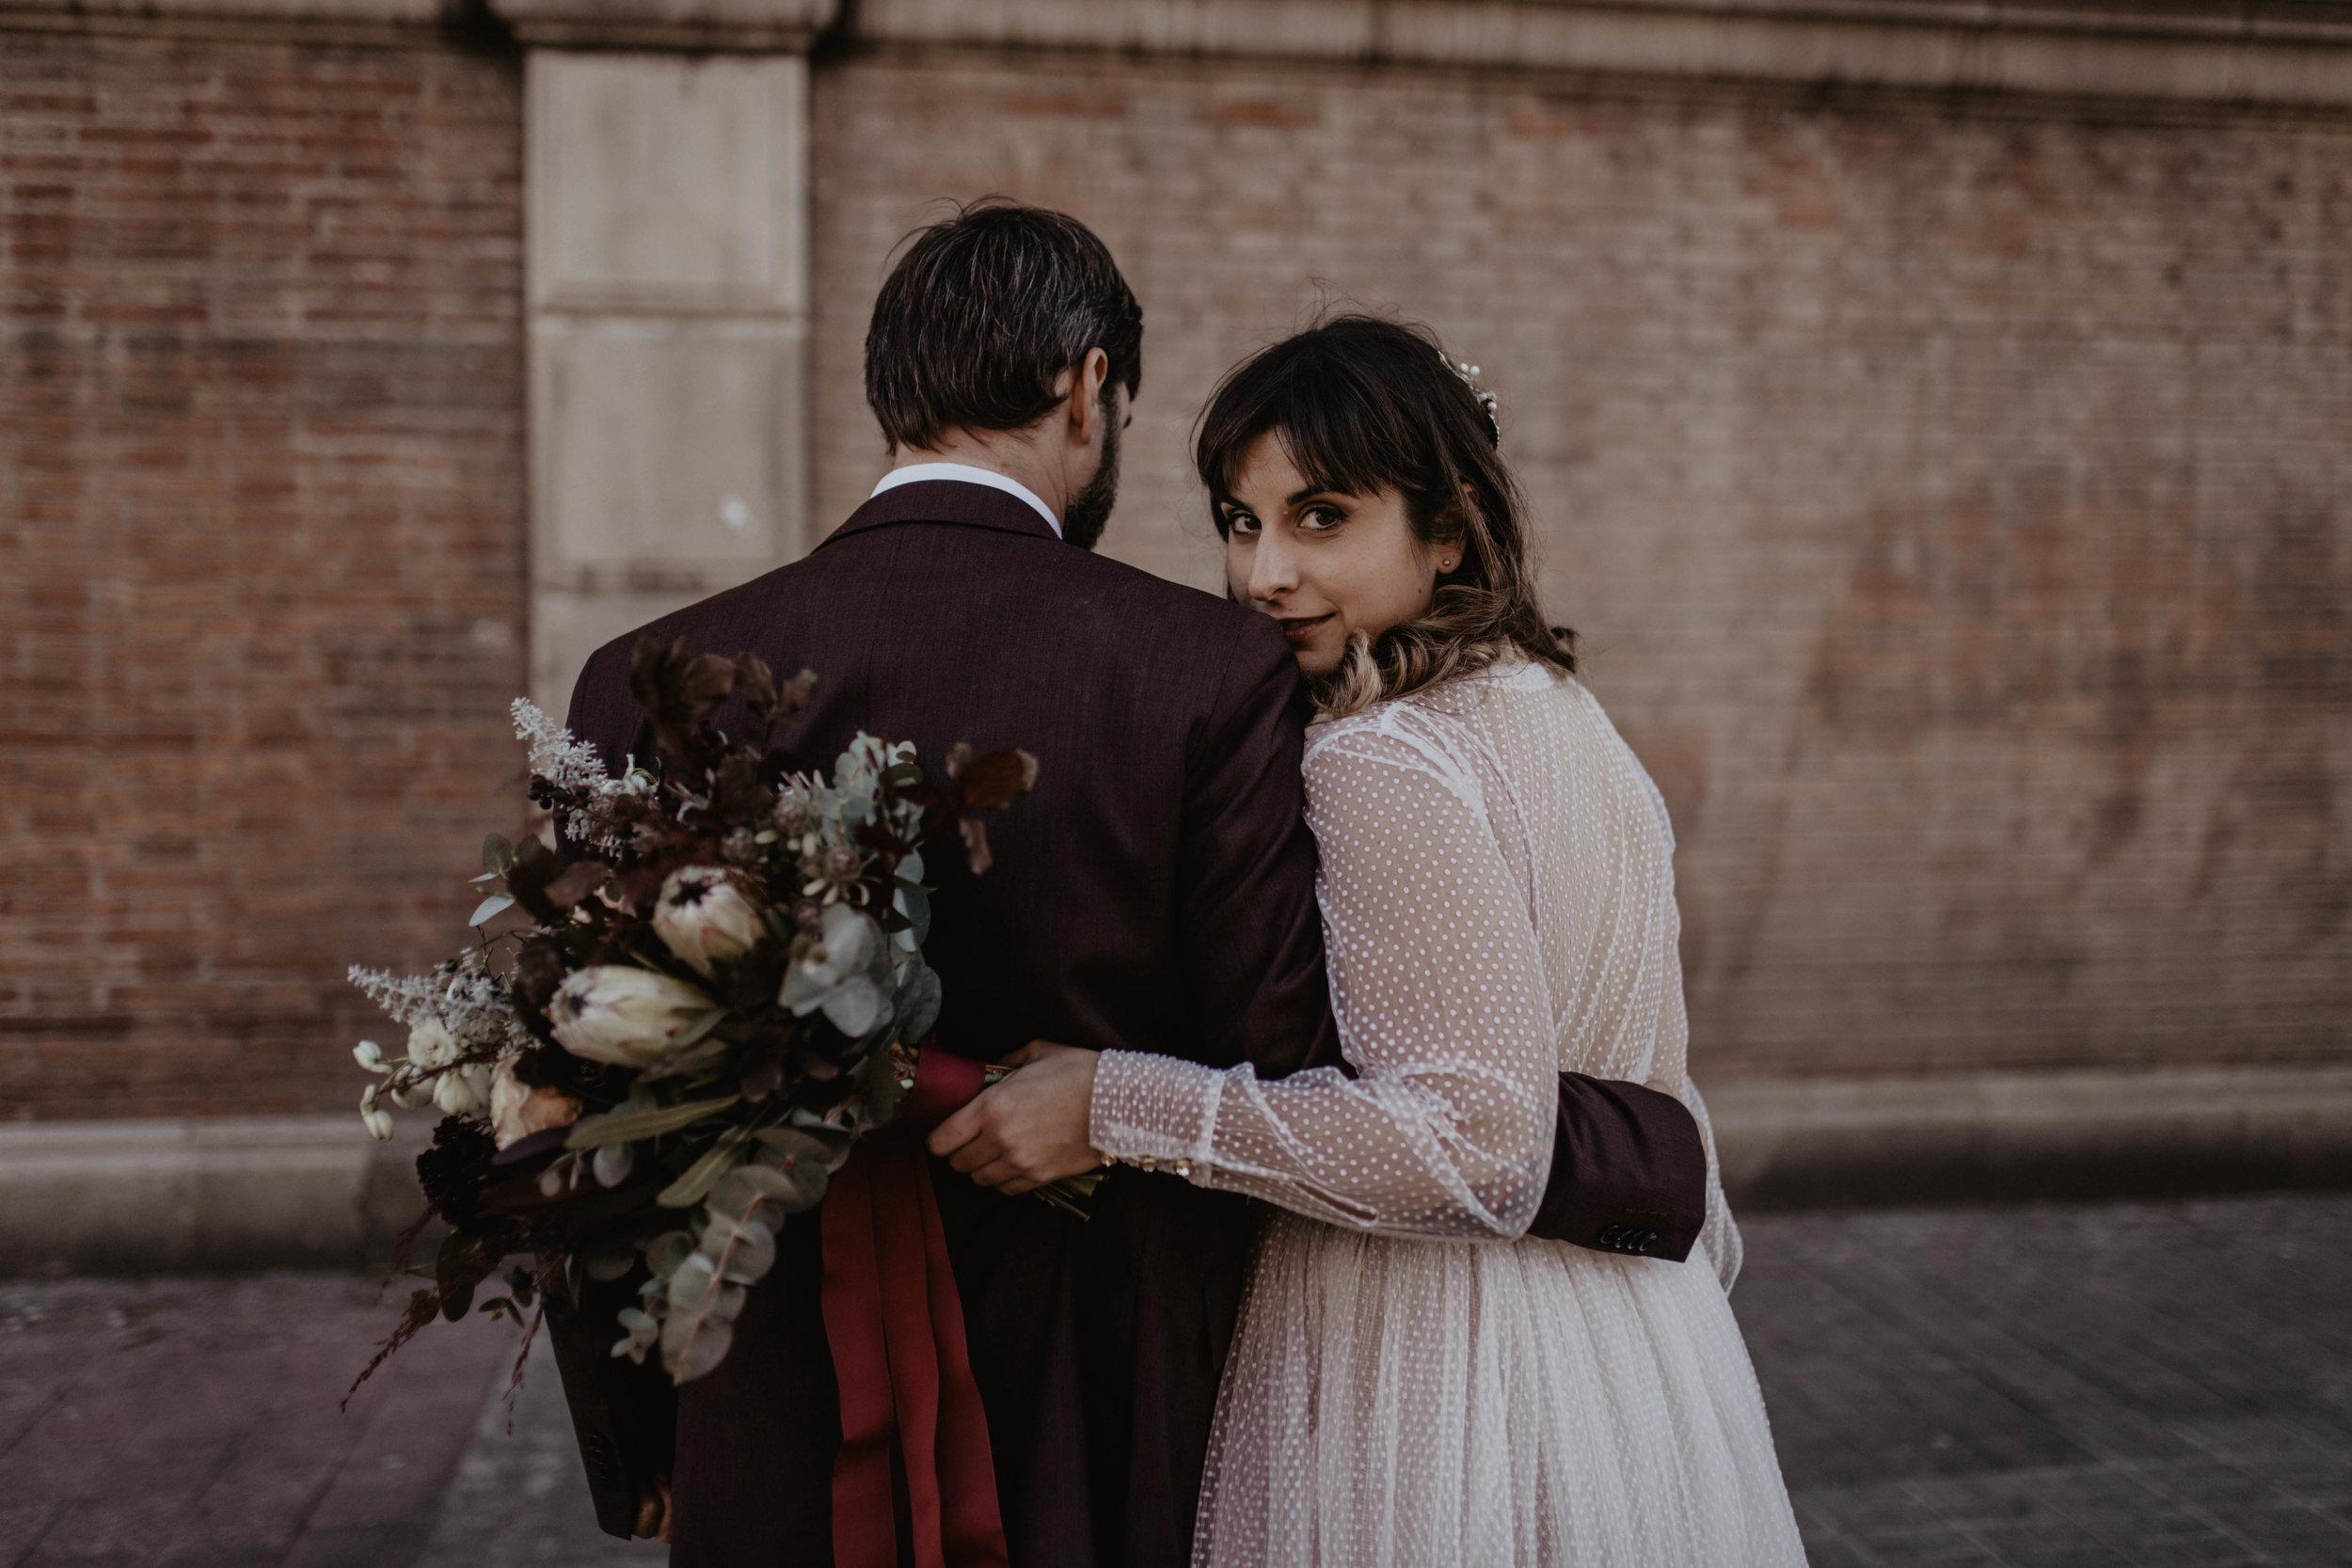 thenortherngirlphotography-photography-weddingphotography-couple-bodasconestilo-bodasenbarcelona-martadavid-471.jpg